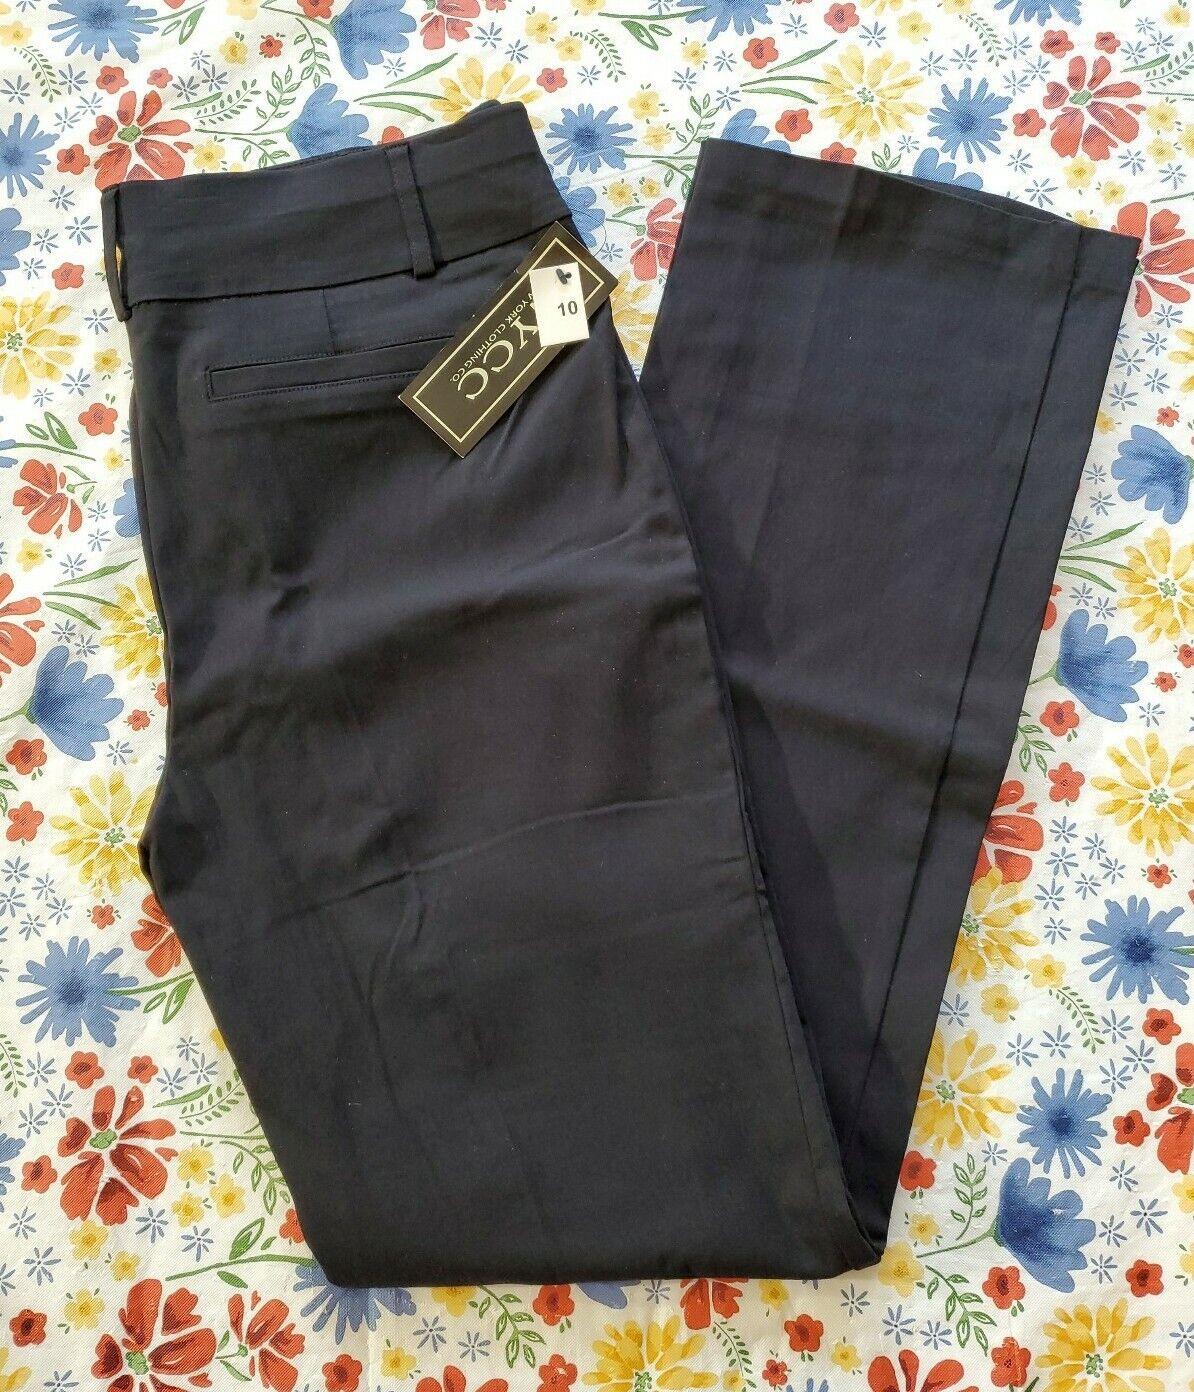 NYCC SIZE 10 WOMEN'S BLACK PULL-ON BOOTCUT DRESS PANTS